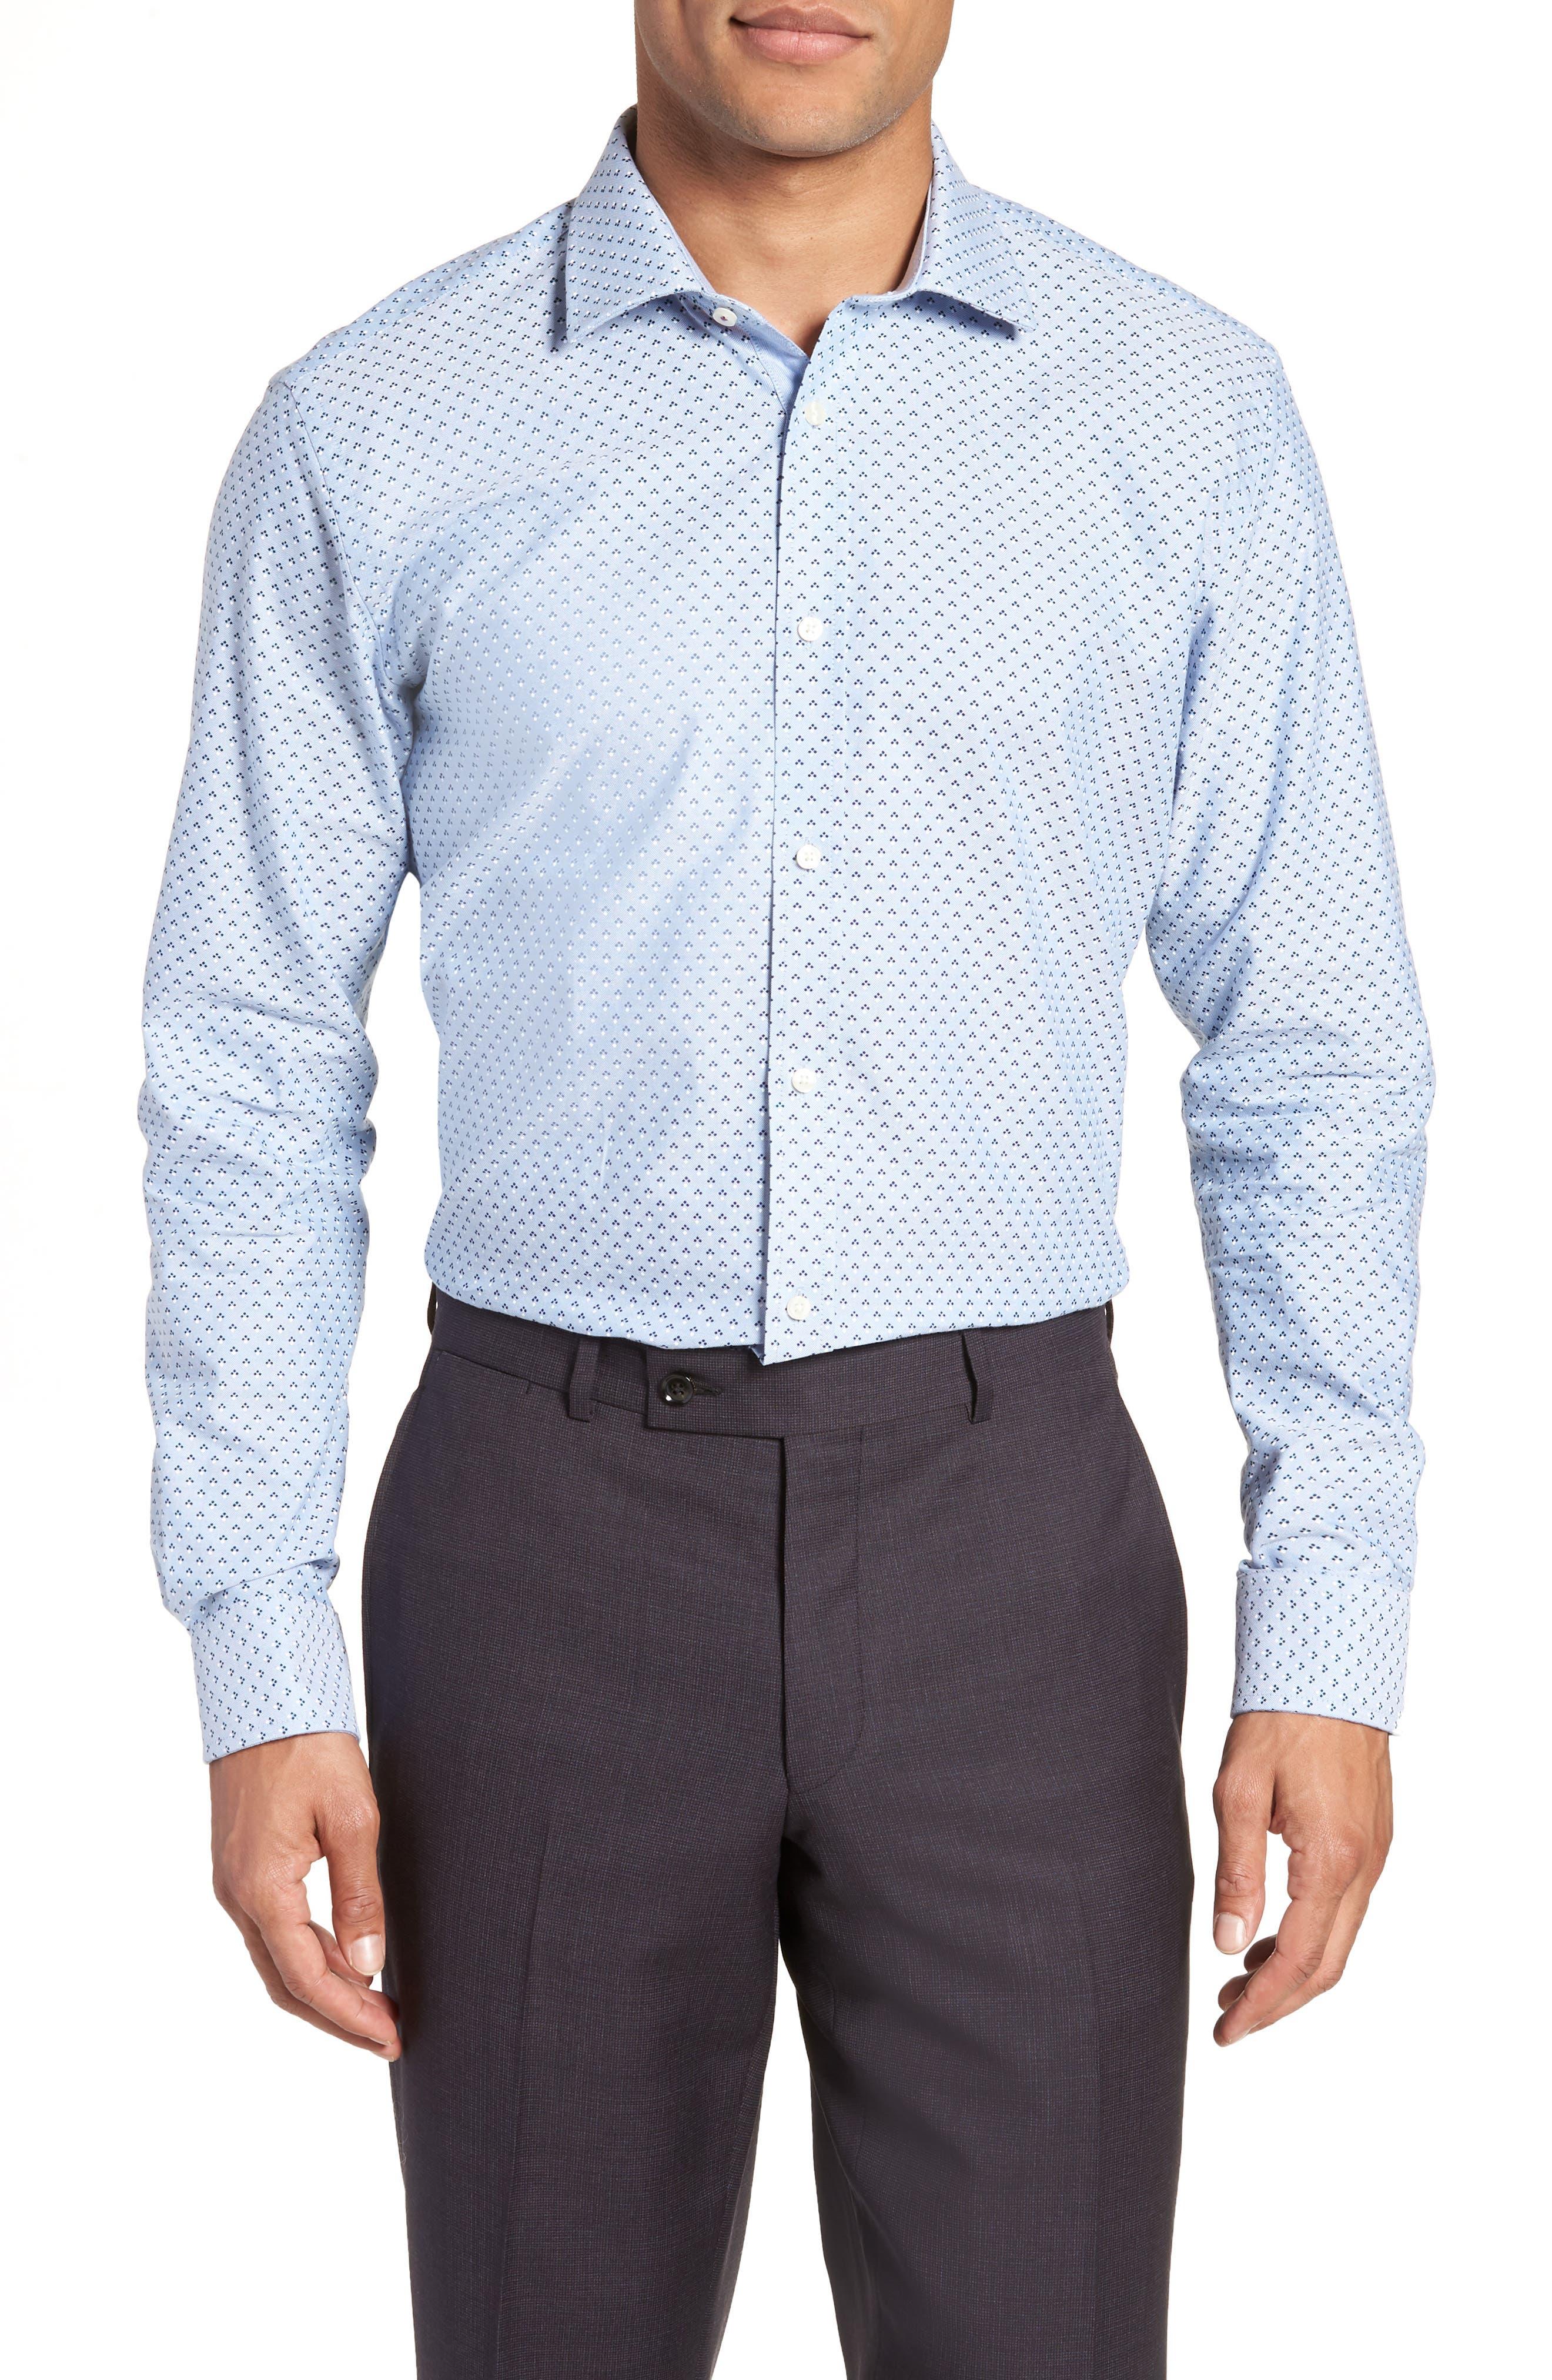 Forestr Trim Fit Geometric Dress Shirt,                         Main,                         color, 421